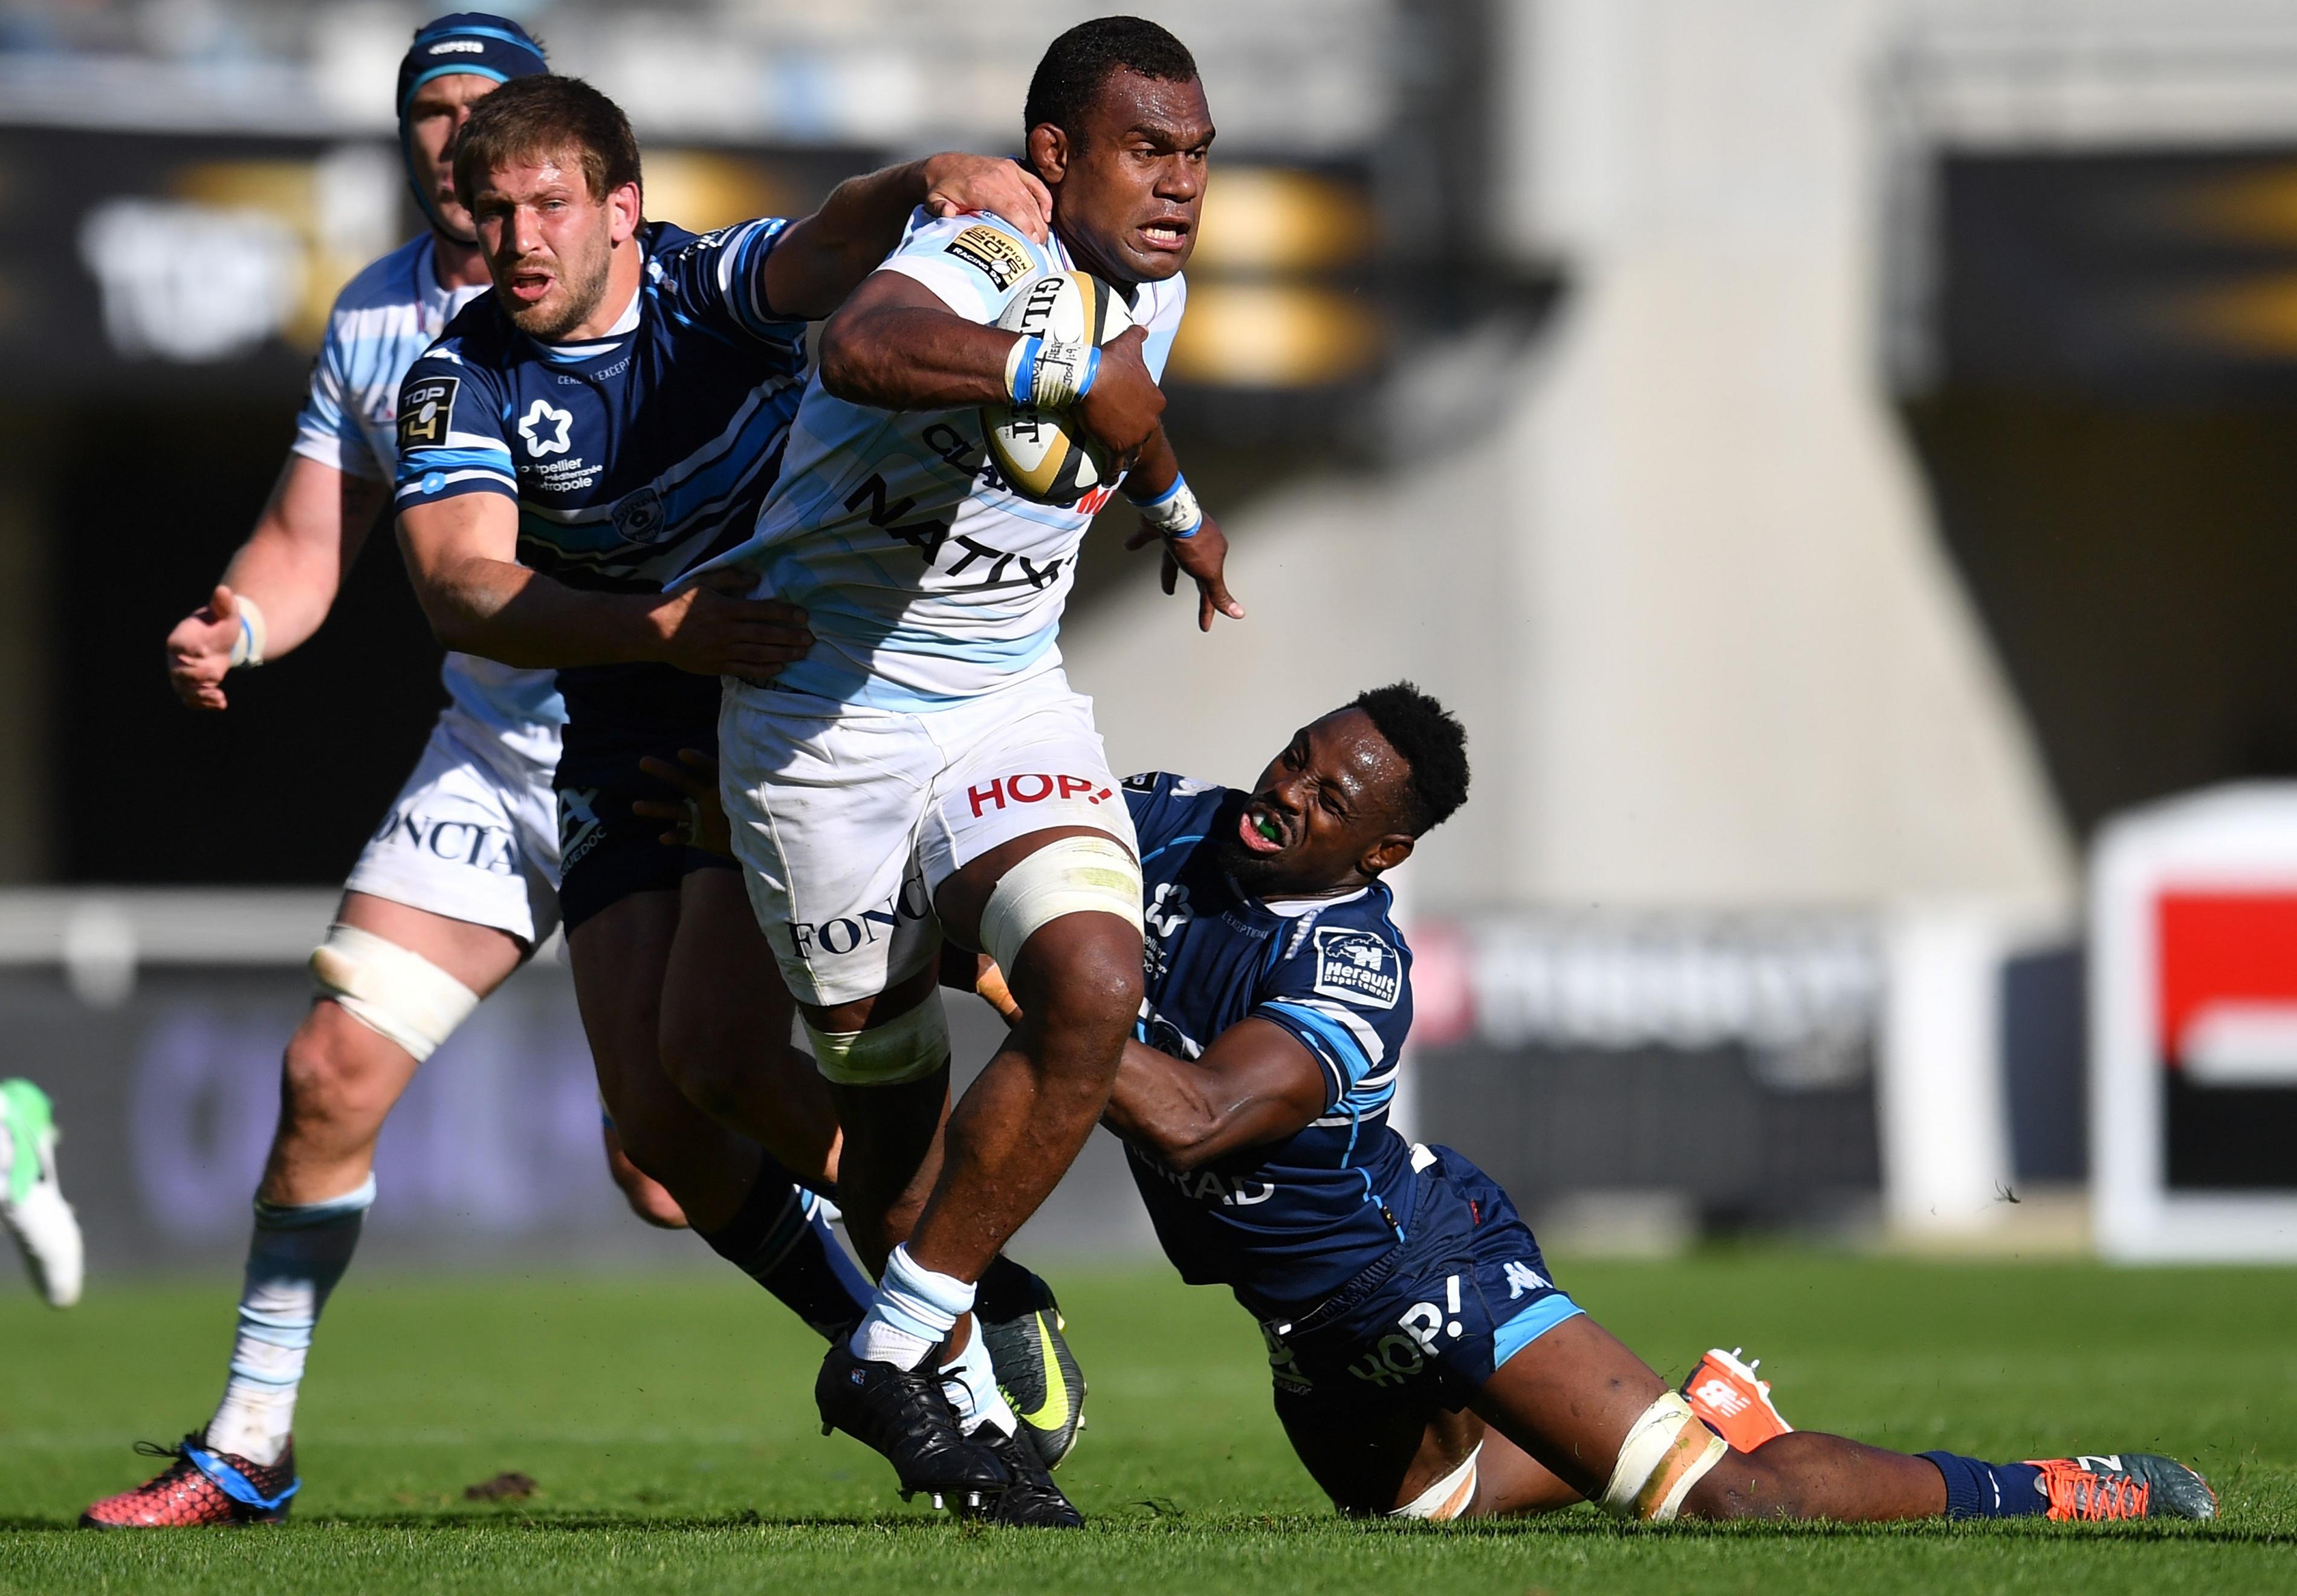 Rugby - Top 14 - Racing : avec Nakarawa, les mains ont la parole